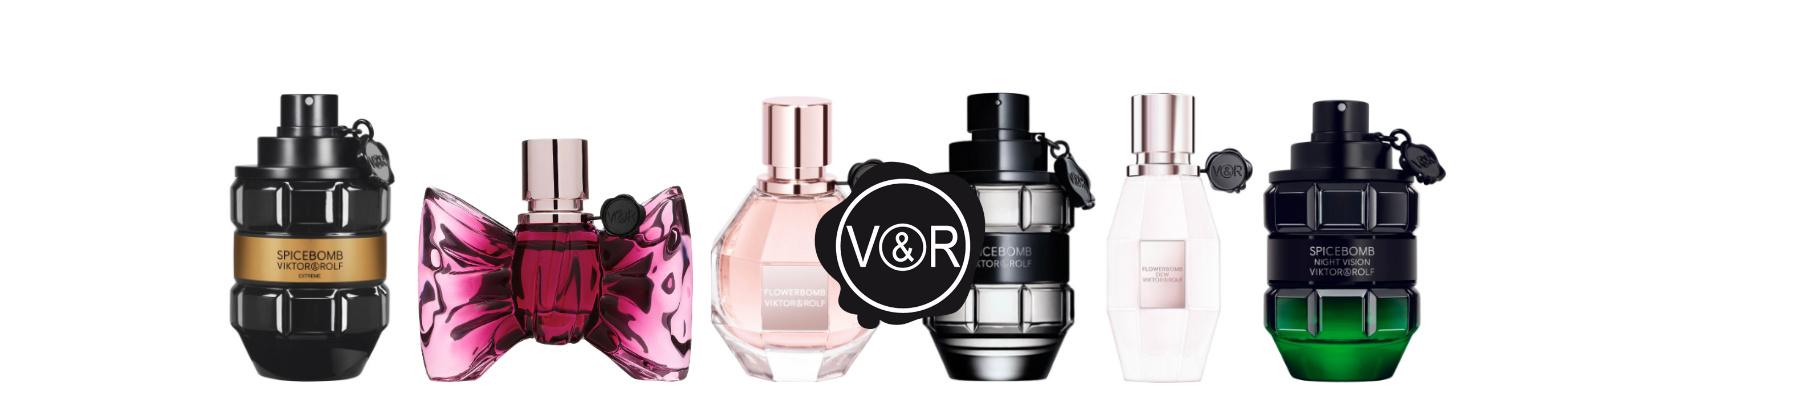 Viktor & Rolf Perfumes